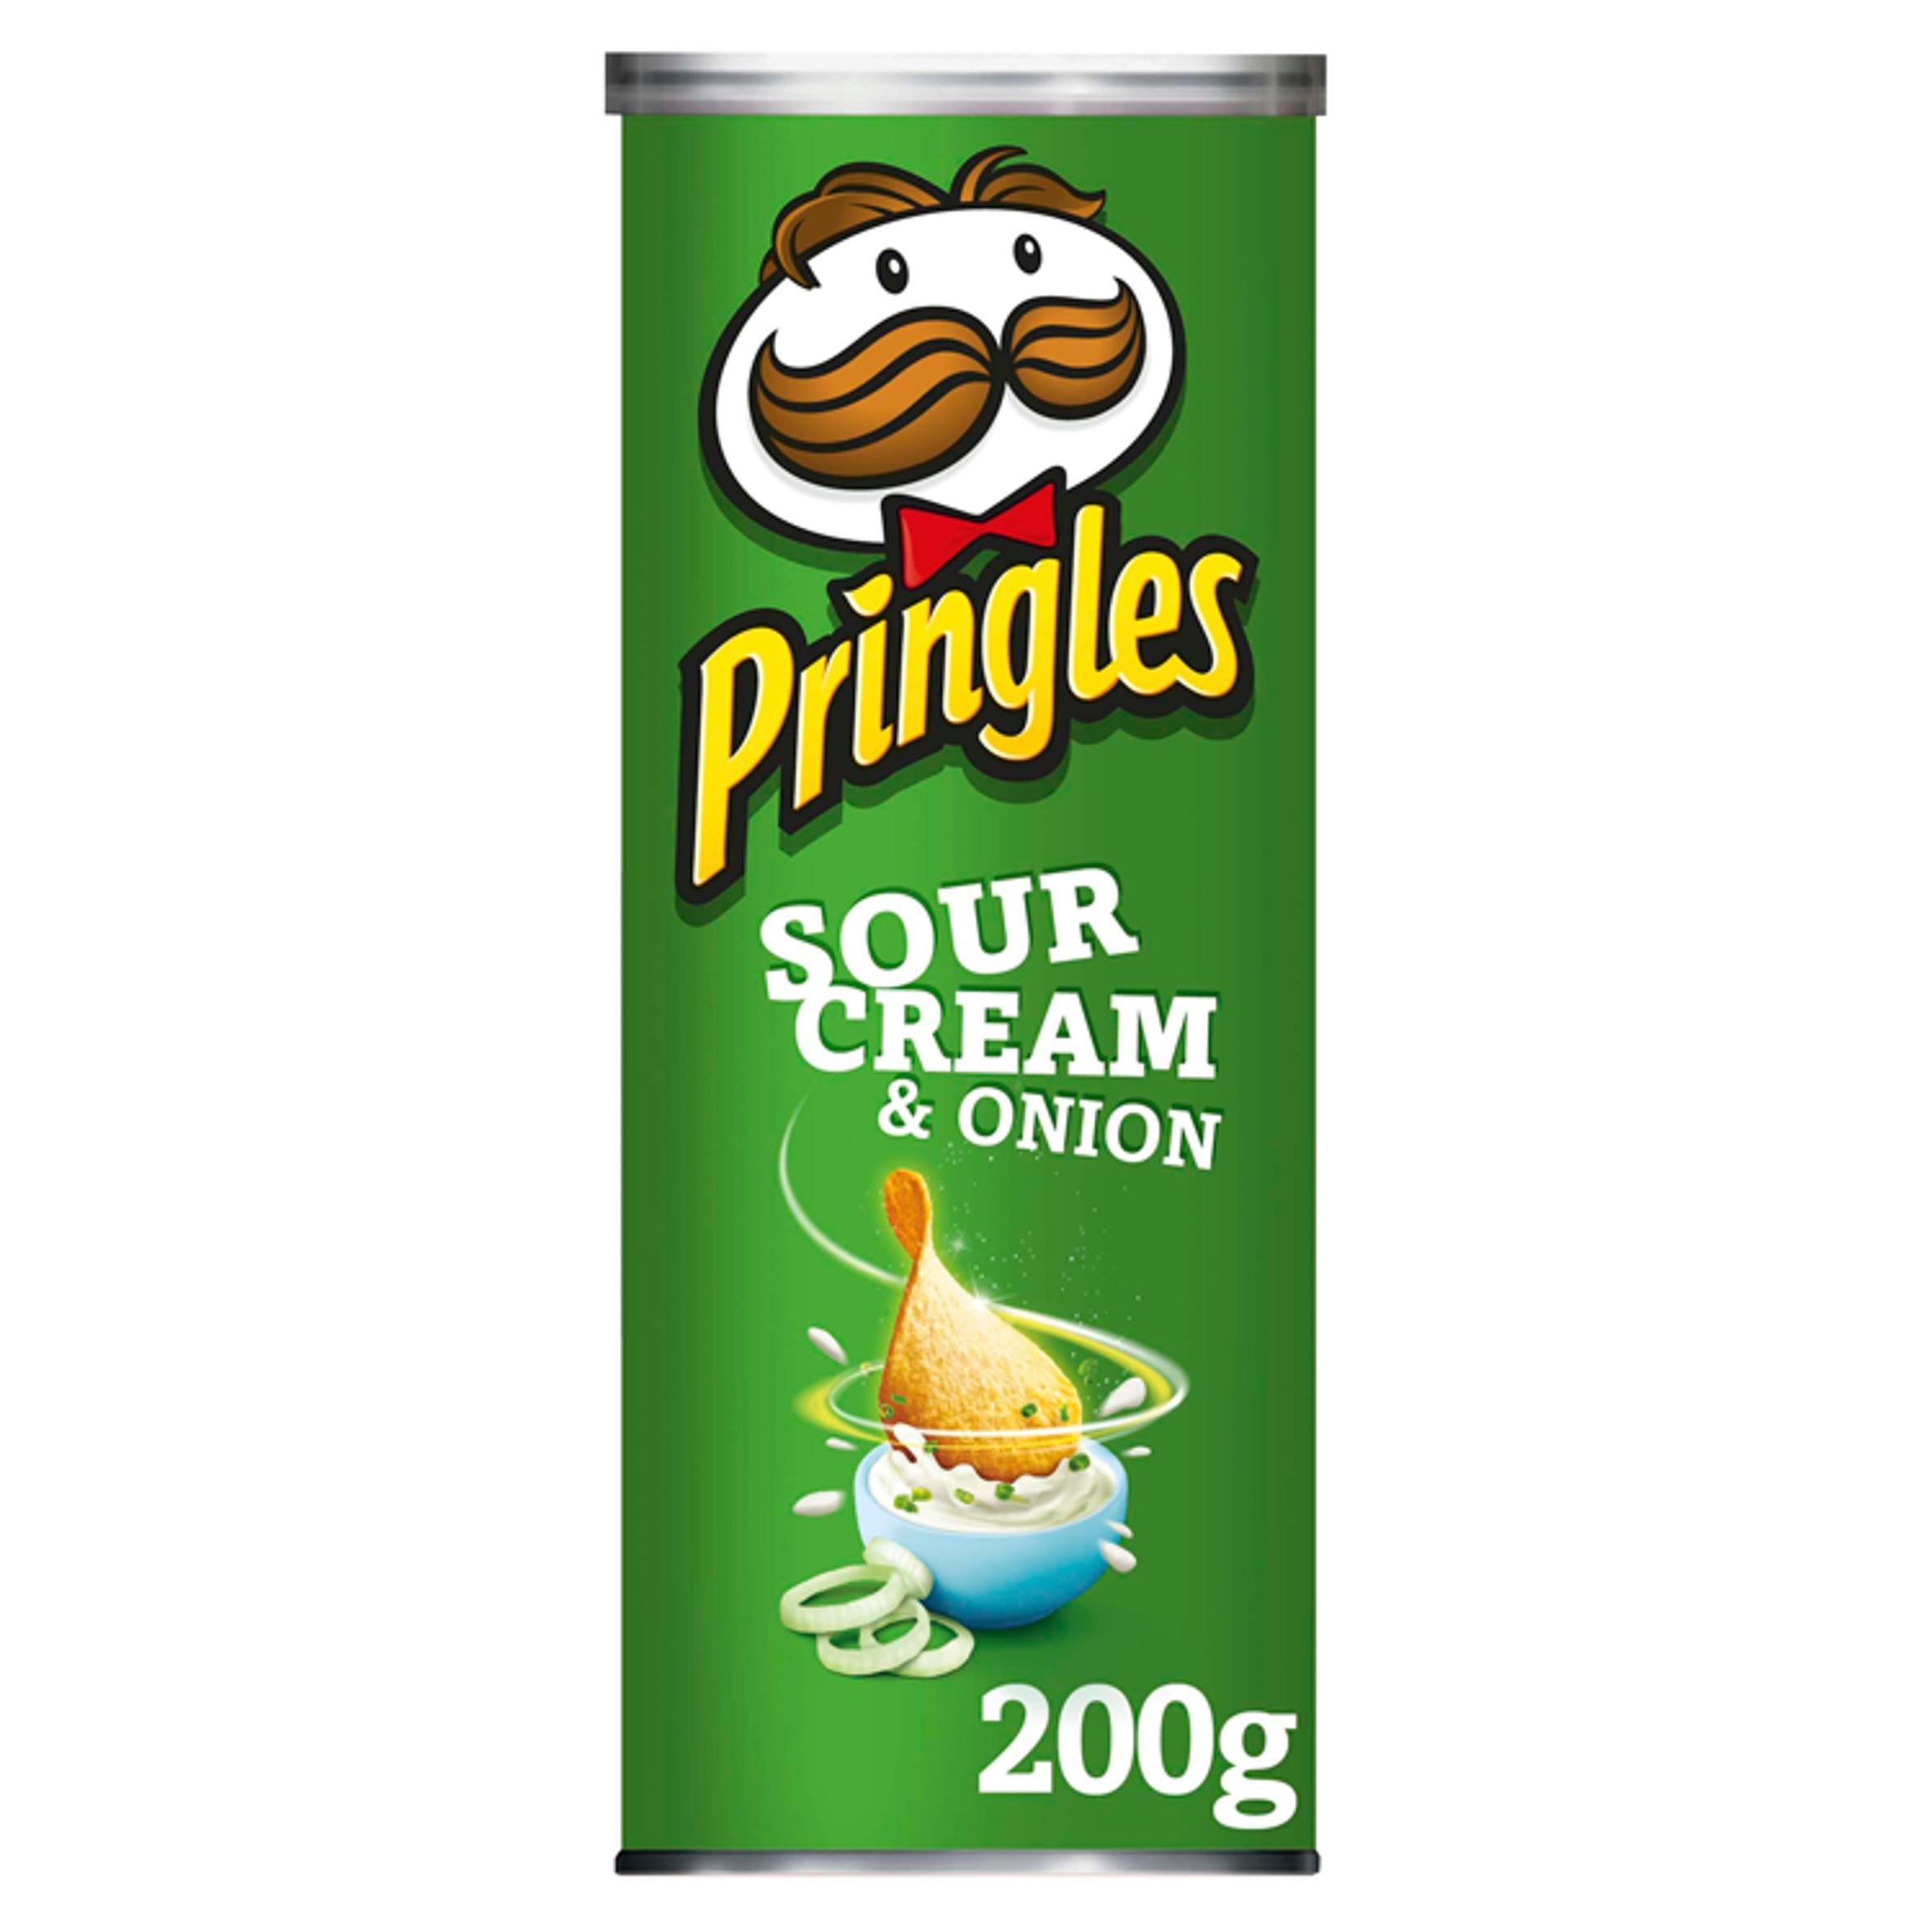 Pringles Sour Cream & Onion Crisps, 200g - £1.50 (was £3.00) @ Iceland